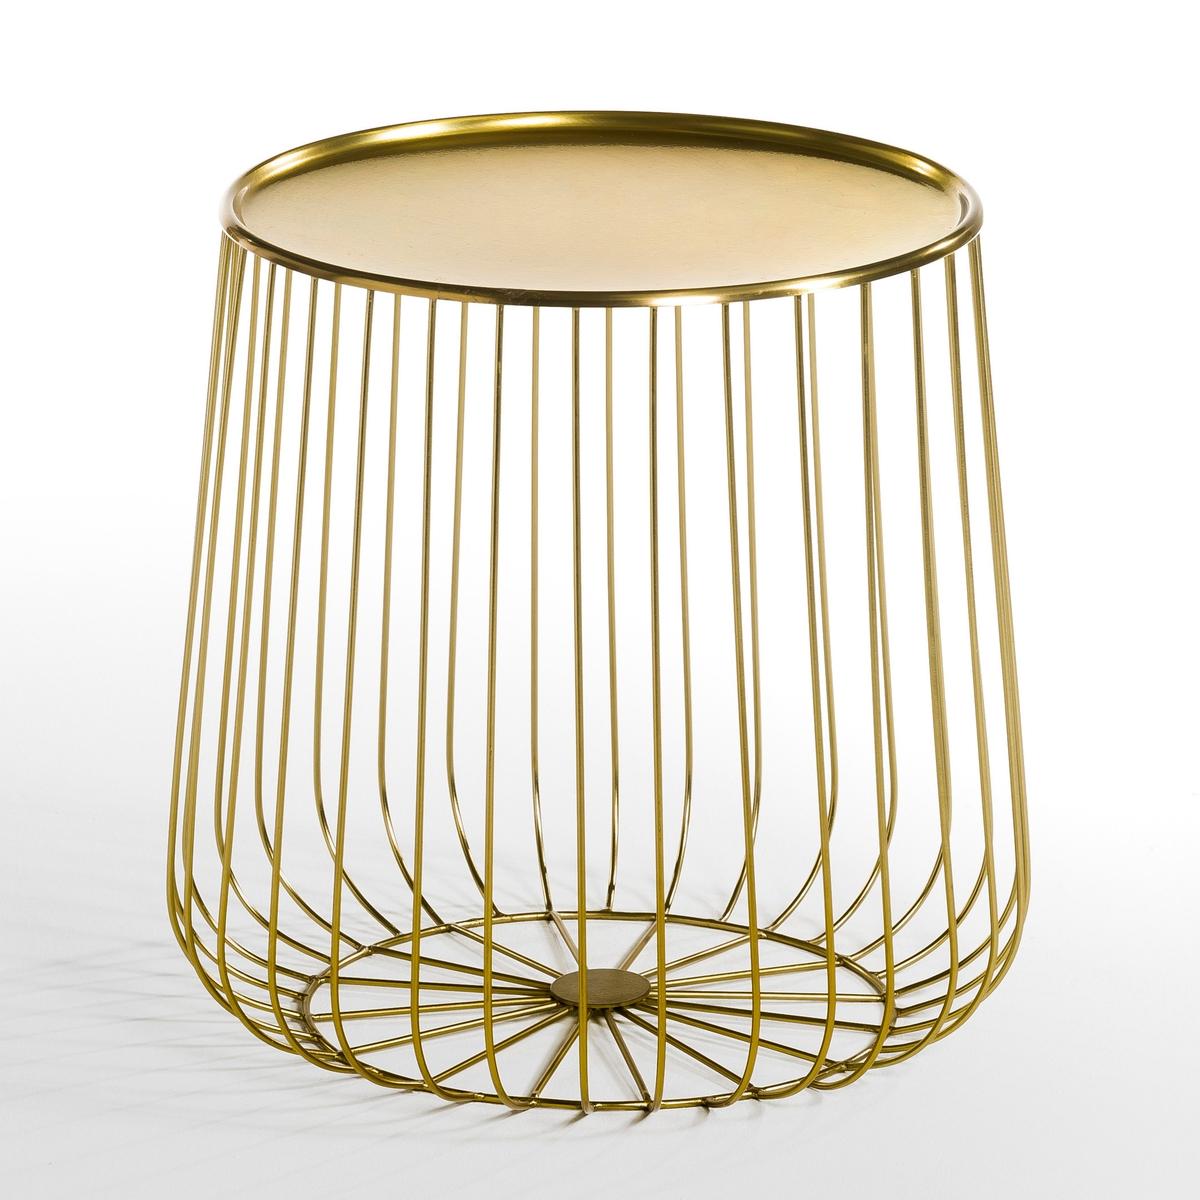 Tavolino filo metallo, Cage